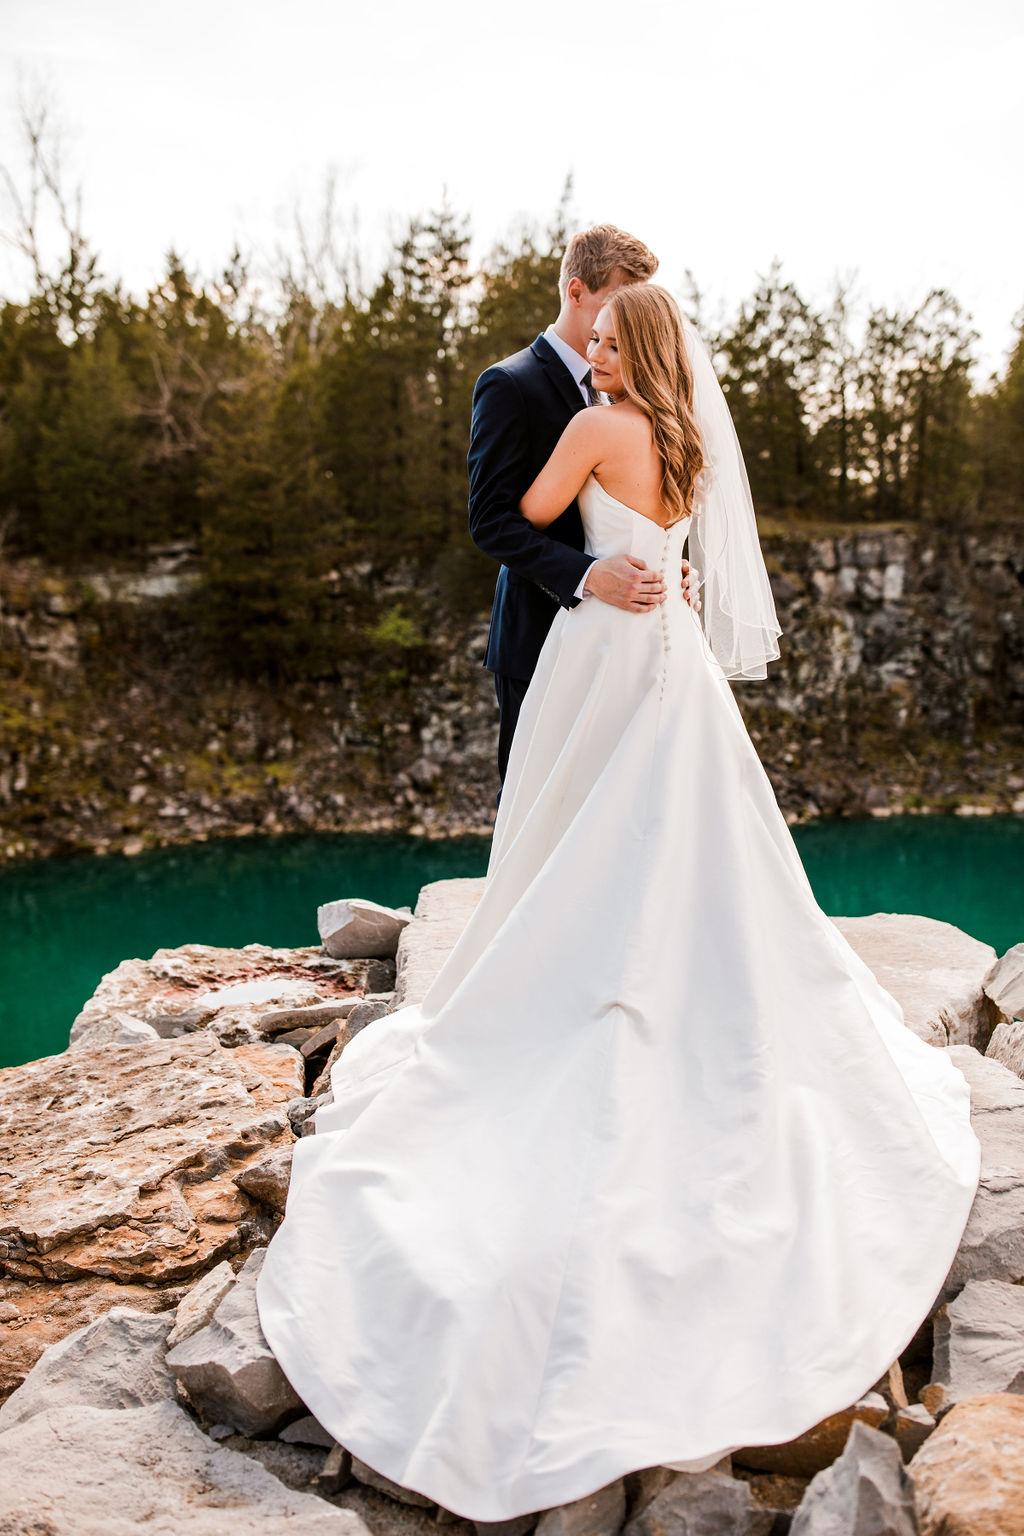 Strapless Wedding Dress: Beautiful Graystone Quarry Wedding captured by John Myers Photography & Videography